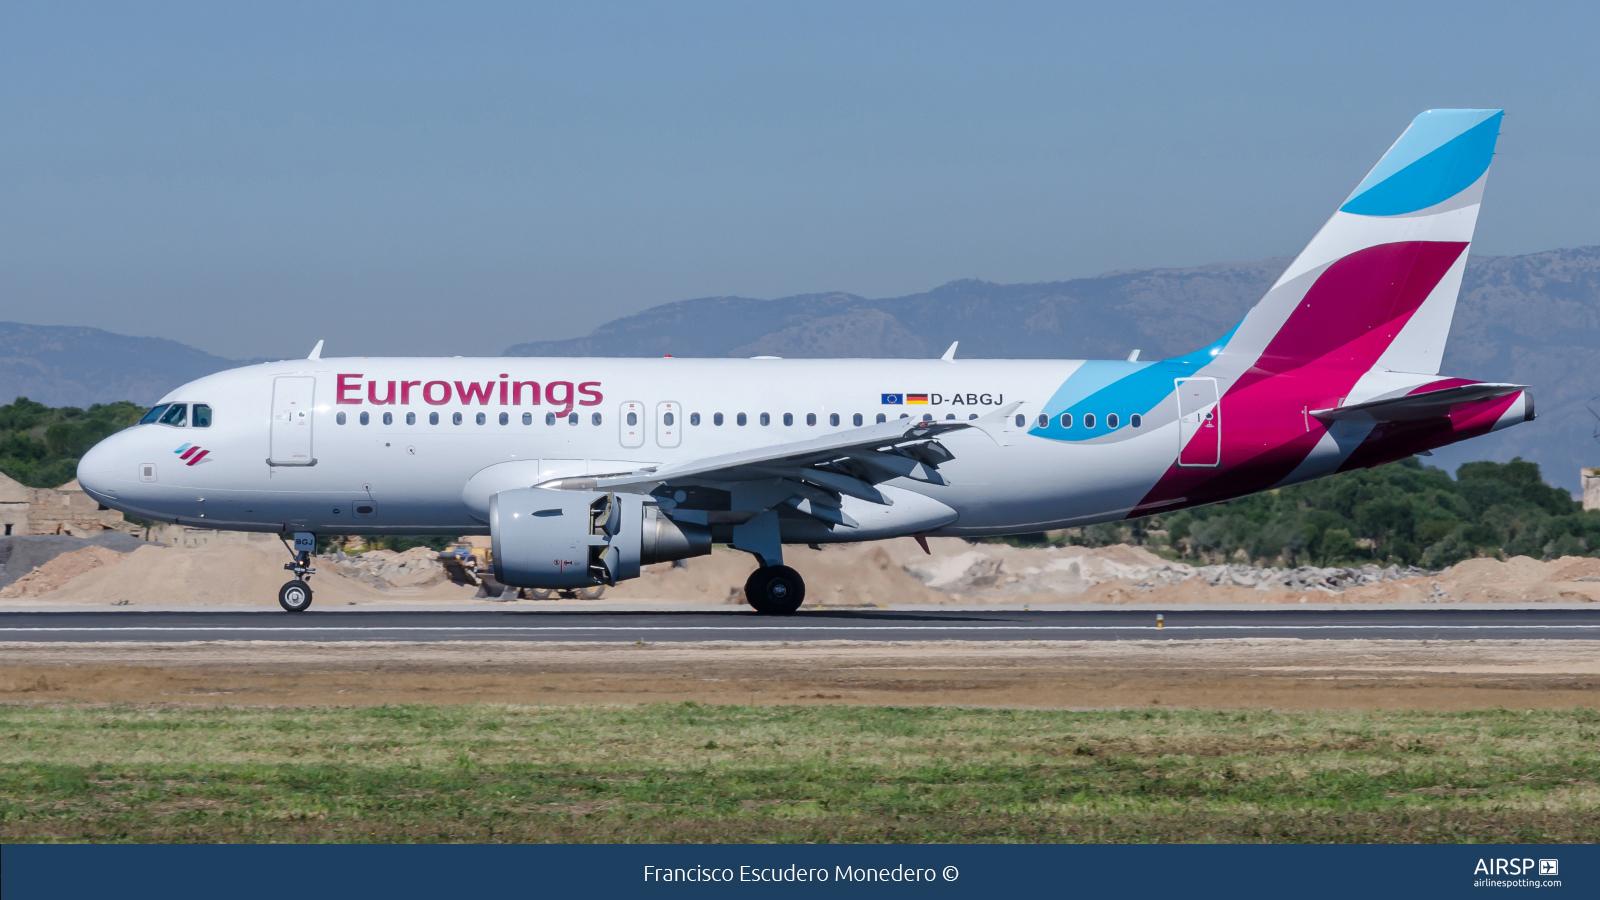 EurowingsAirbus A319D-ABGJ